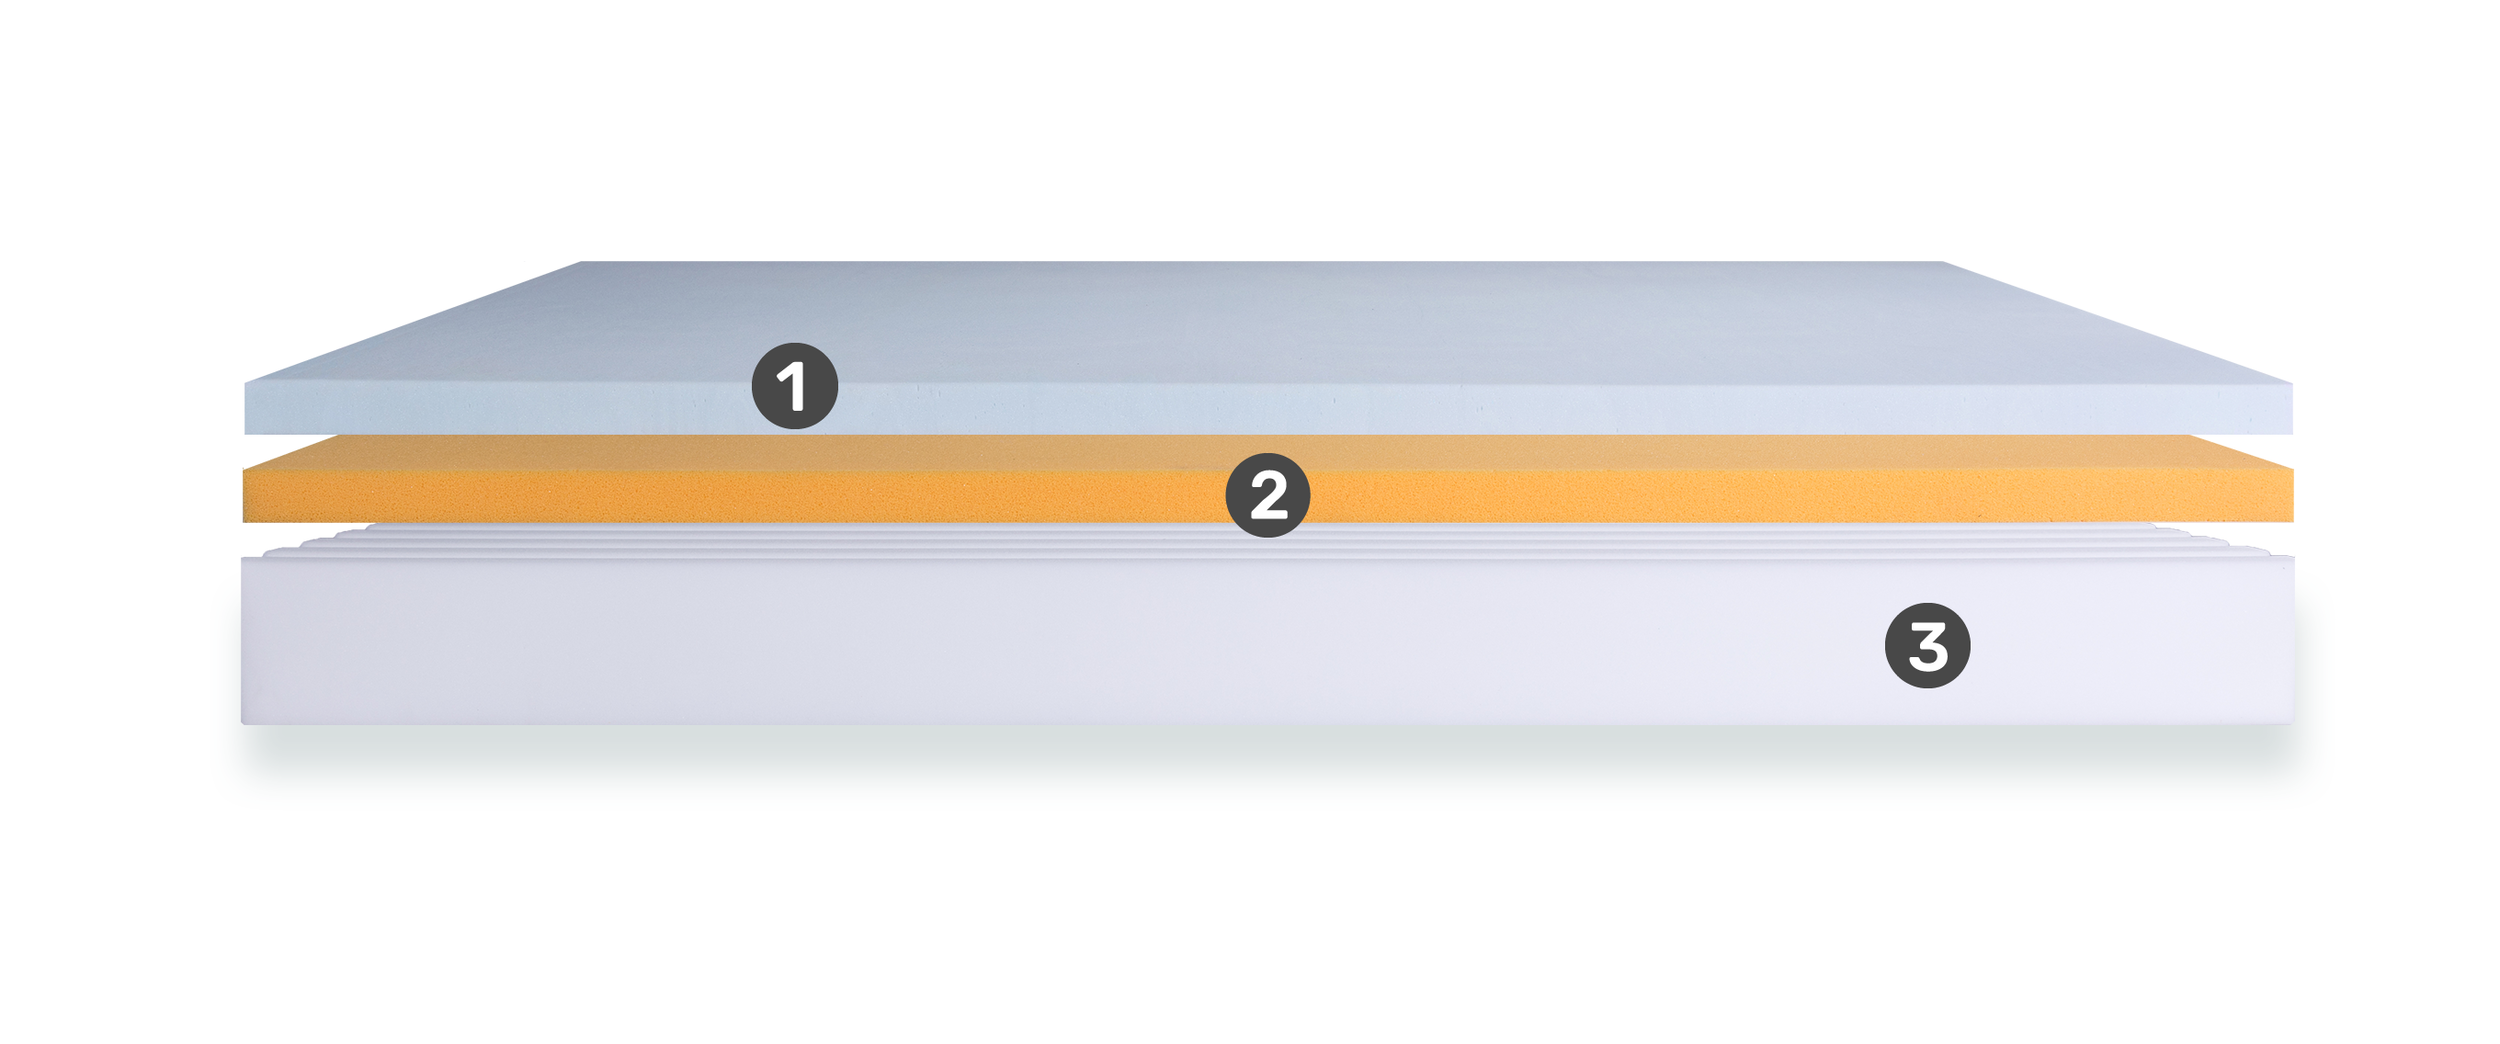 S-FLEX Diagram (numbers)-01.png